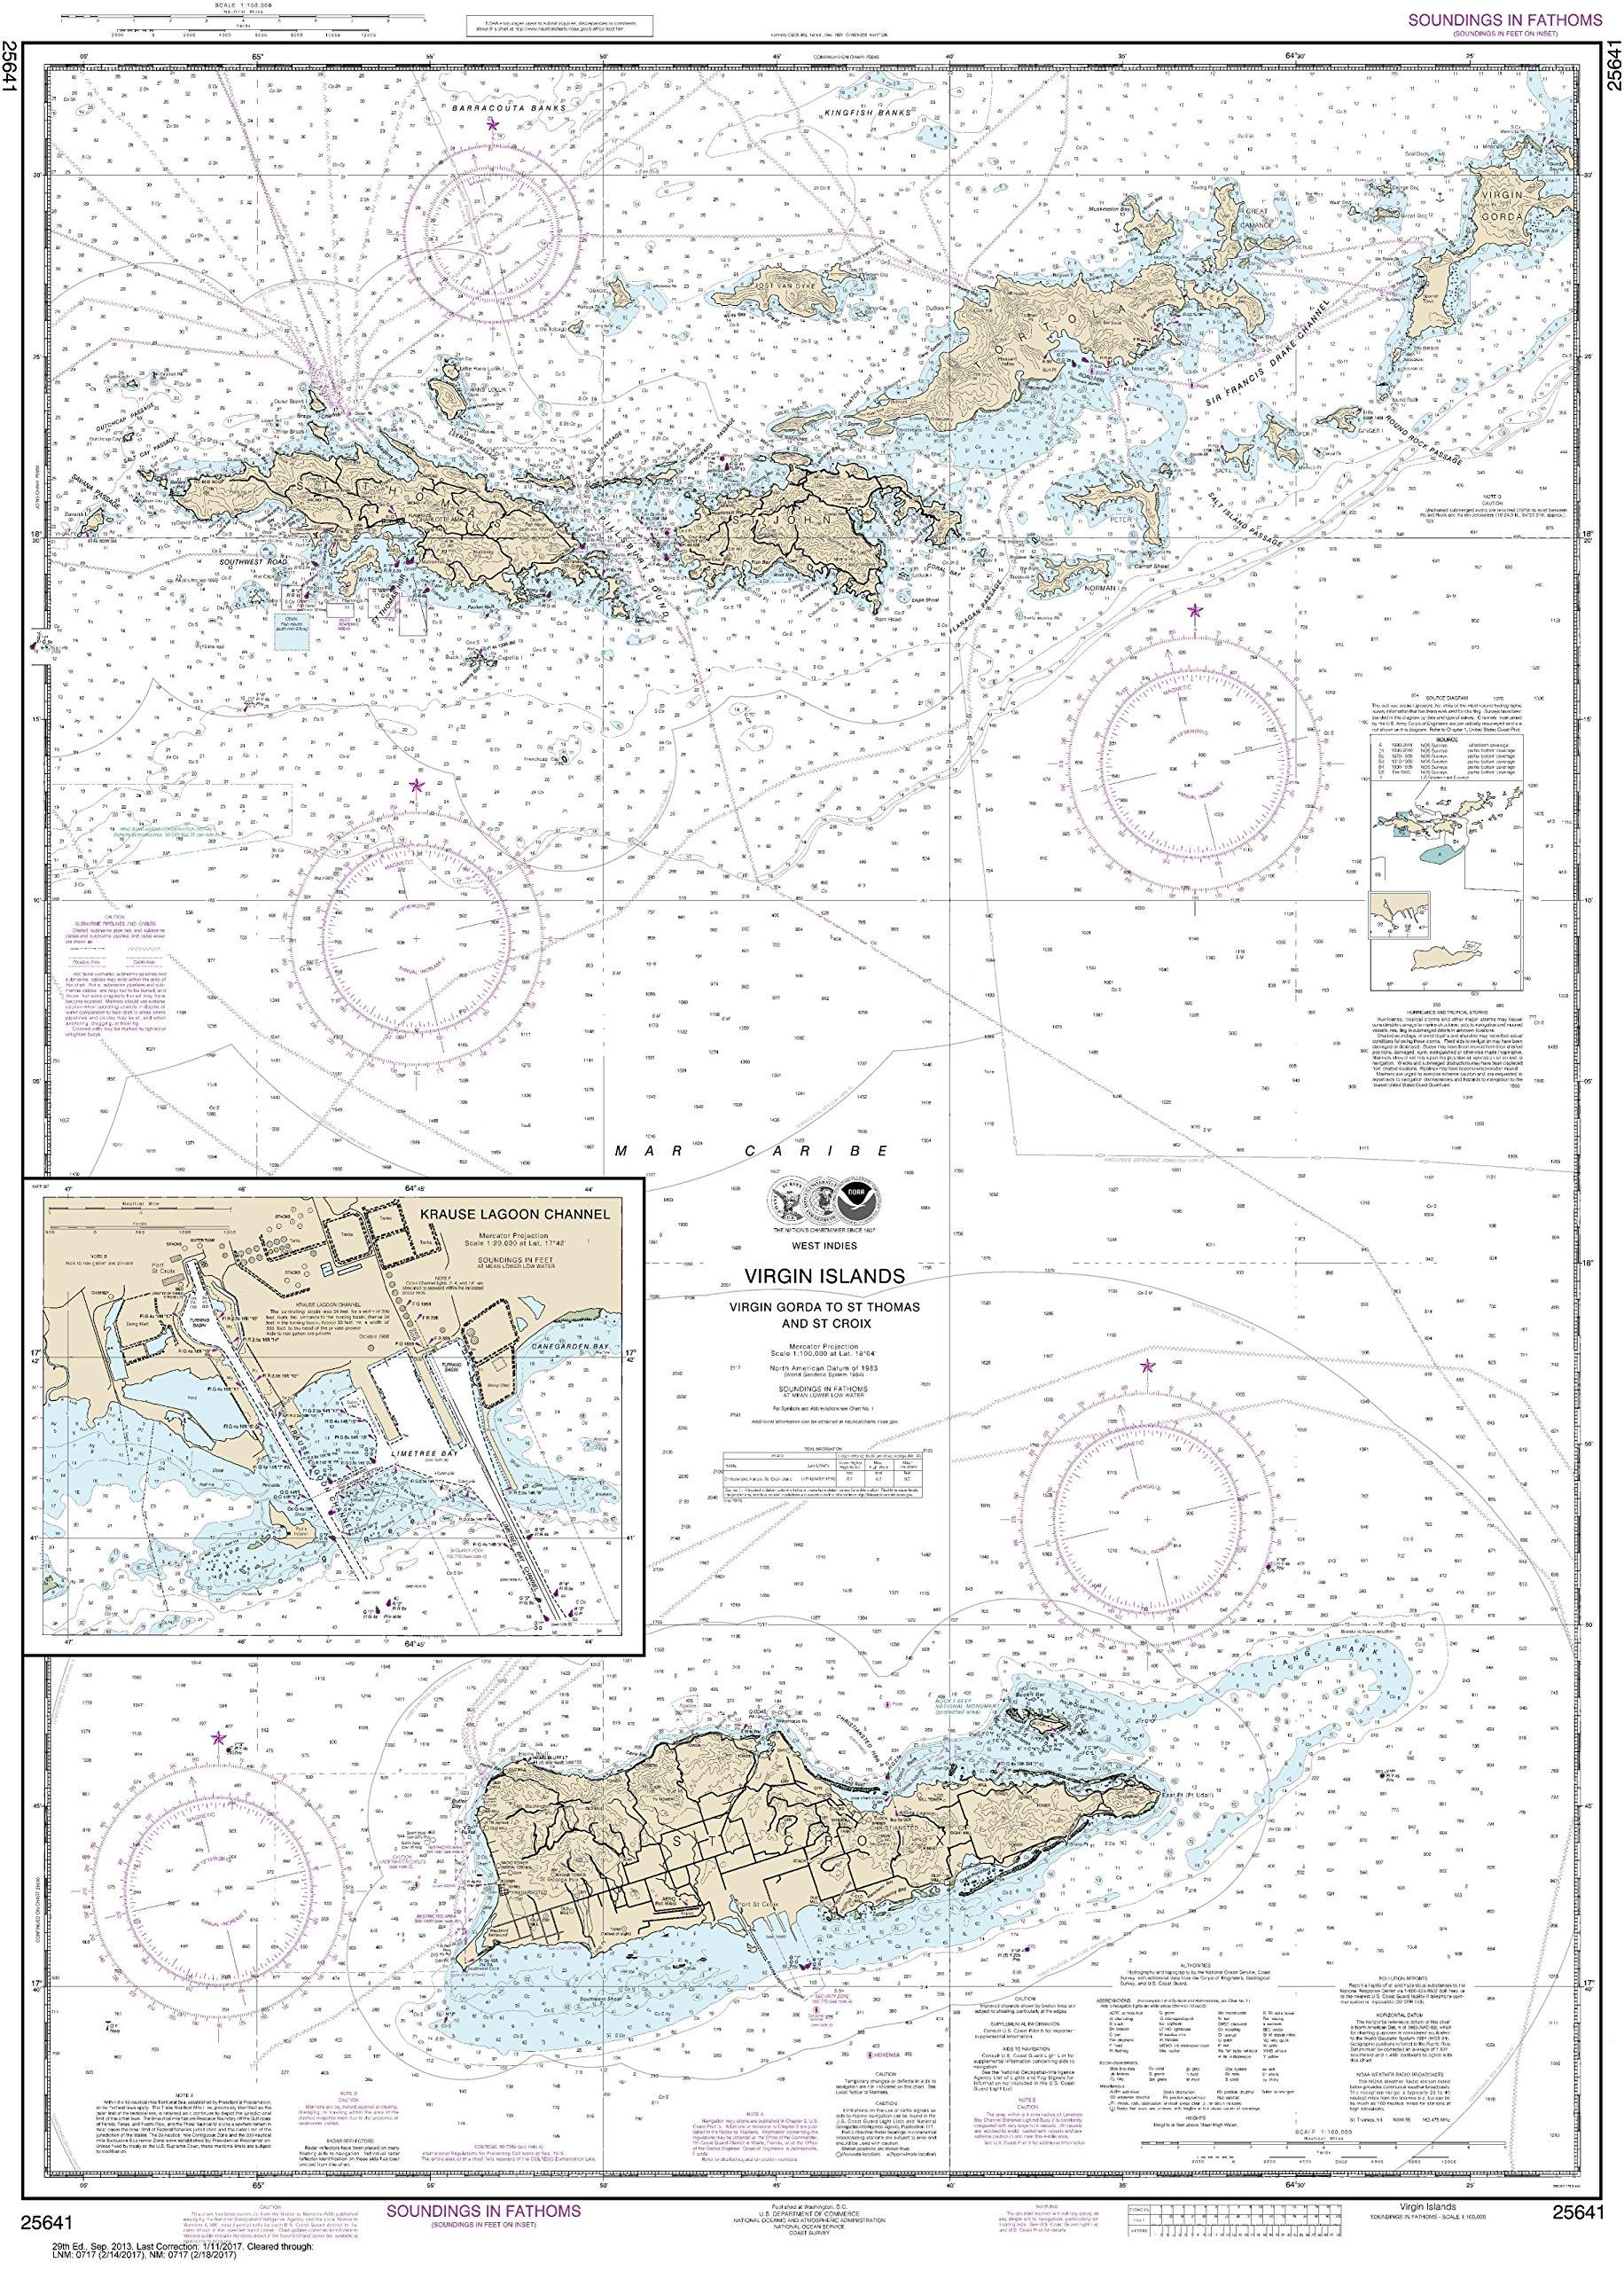 MapHouse NOAA Chart 25641 Virgin Islands-Virgin Gorda to St. Thomas St. Croix;Krause Lagoon Channel: 45.52'' X 32.58'' Paper Chart